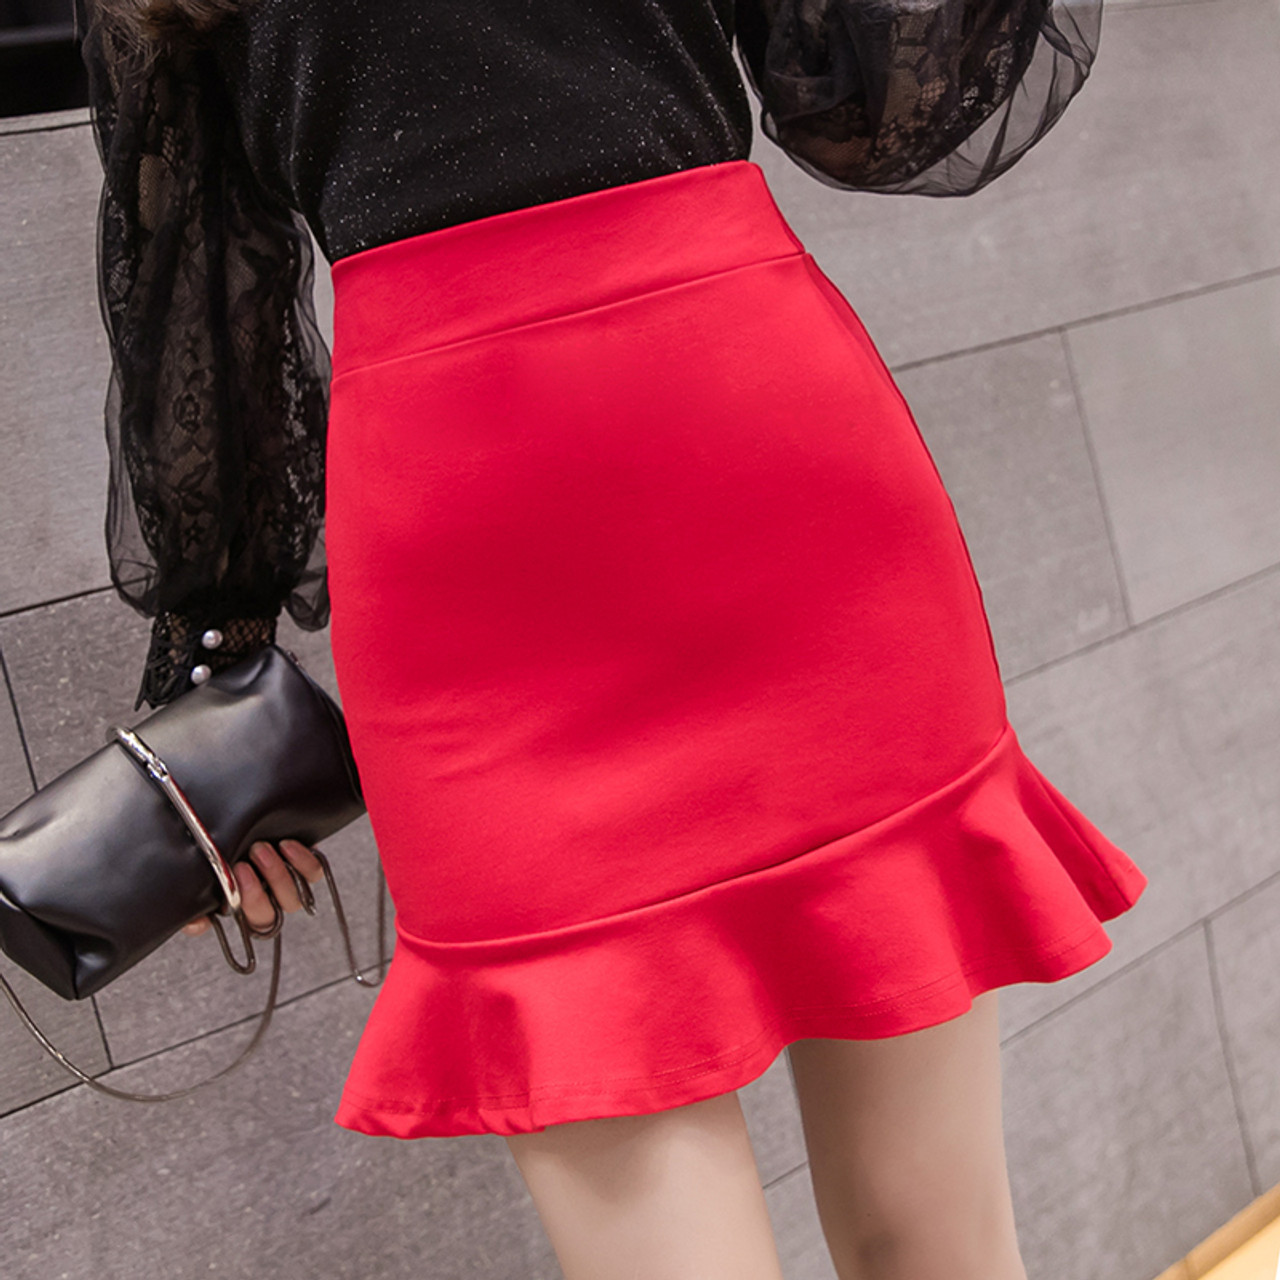 aaff74d43c3 ... 2018 Women Short Pencil Skirt Slim Bodycon High Waist Ruffles Hem  Mermaid Solid Mini Skirt Ladies ...